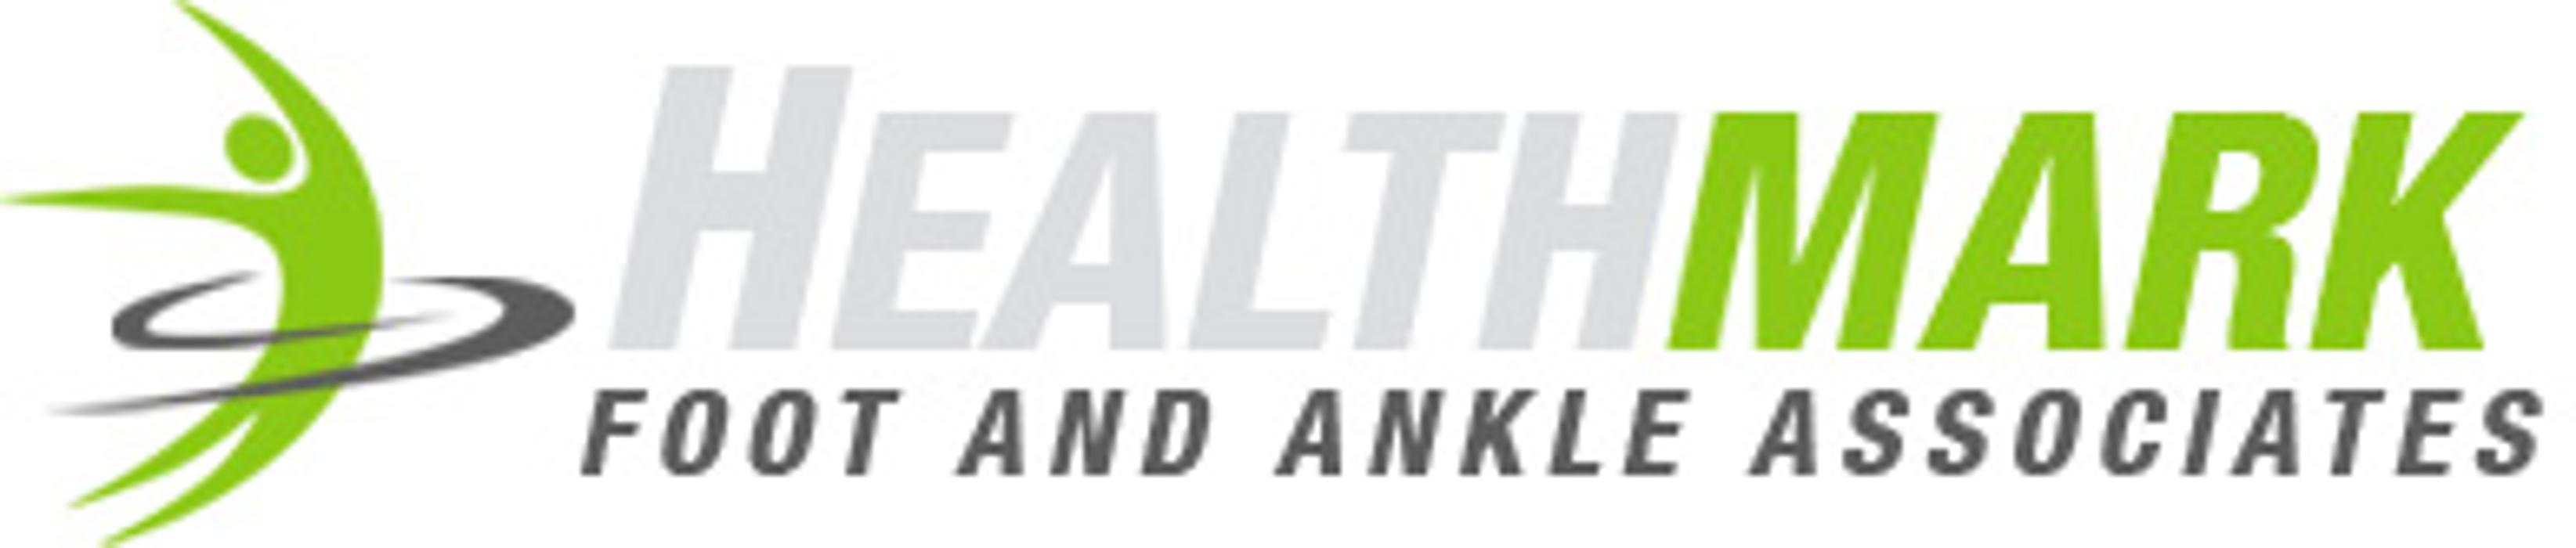 Healthmark Foot & Ankle Associates - Phoenixville, PA